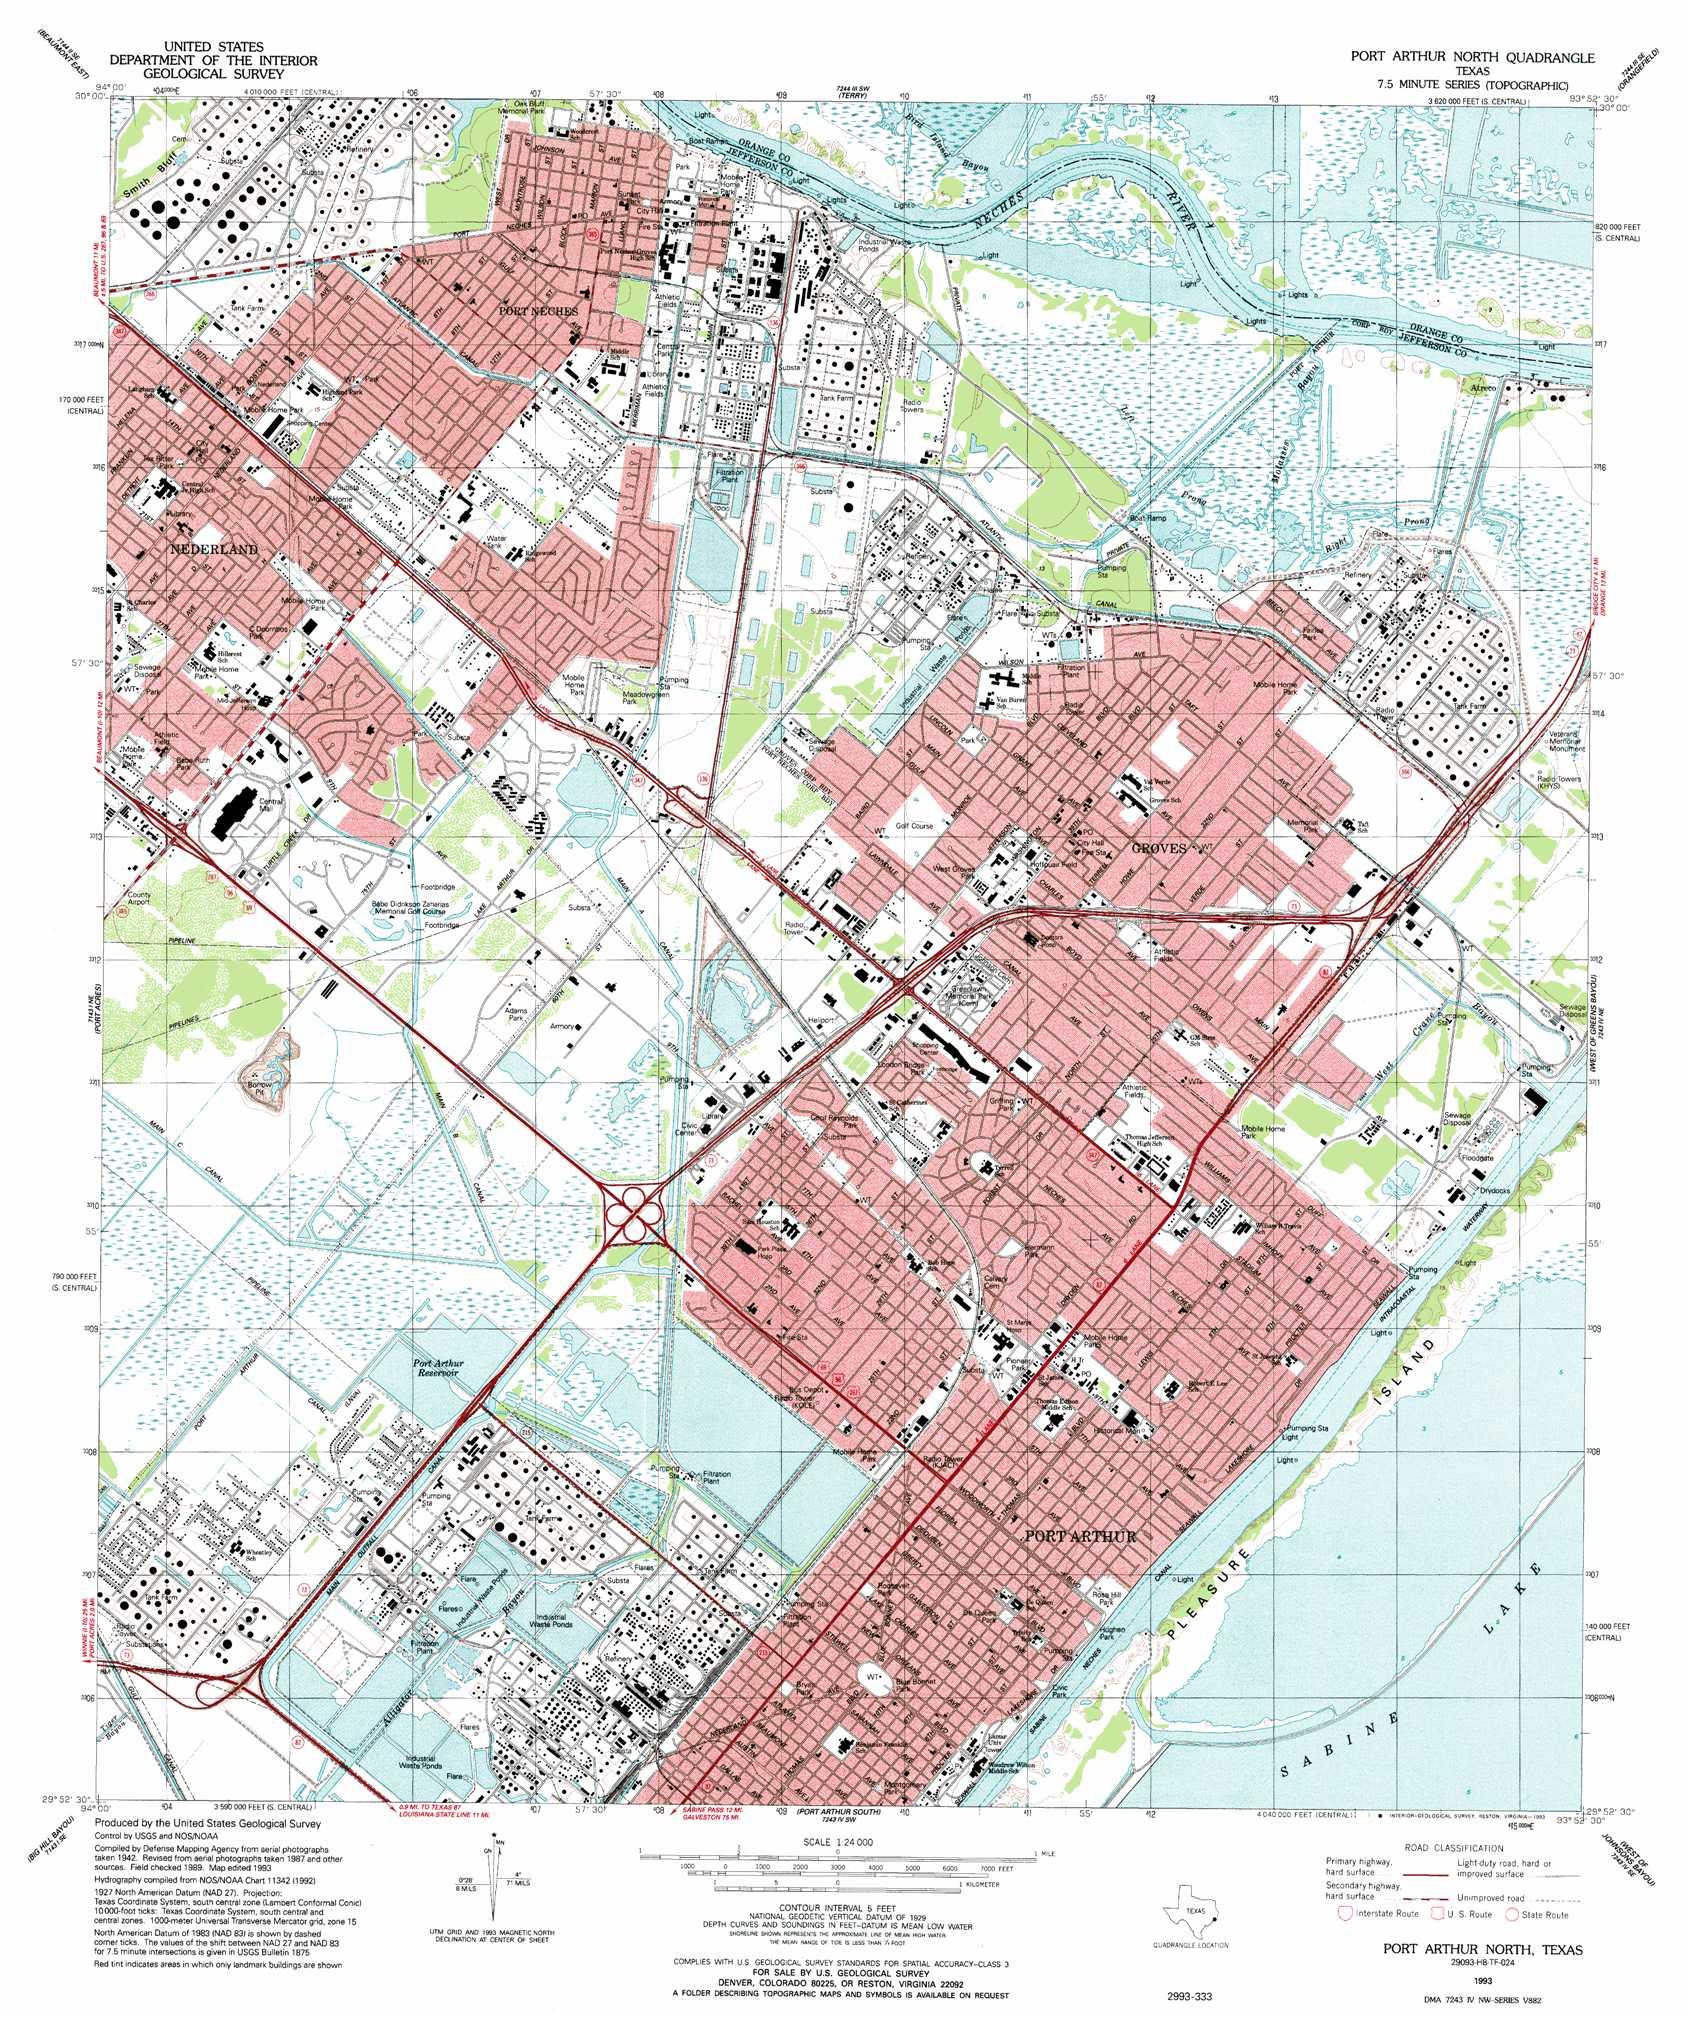 Port Arthur North Topographic Map TX USGS Topo Quad H - Us digital topographic maps